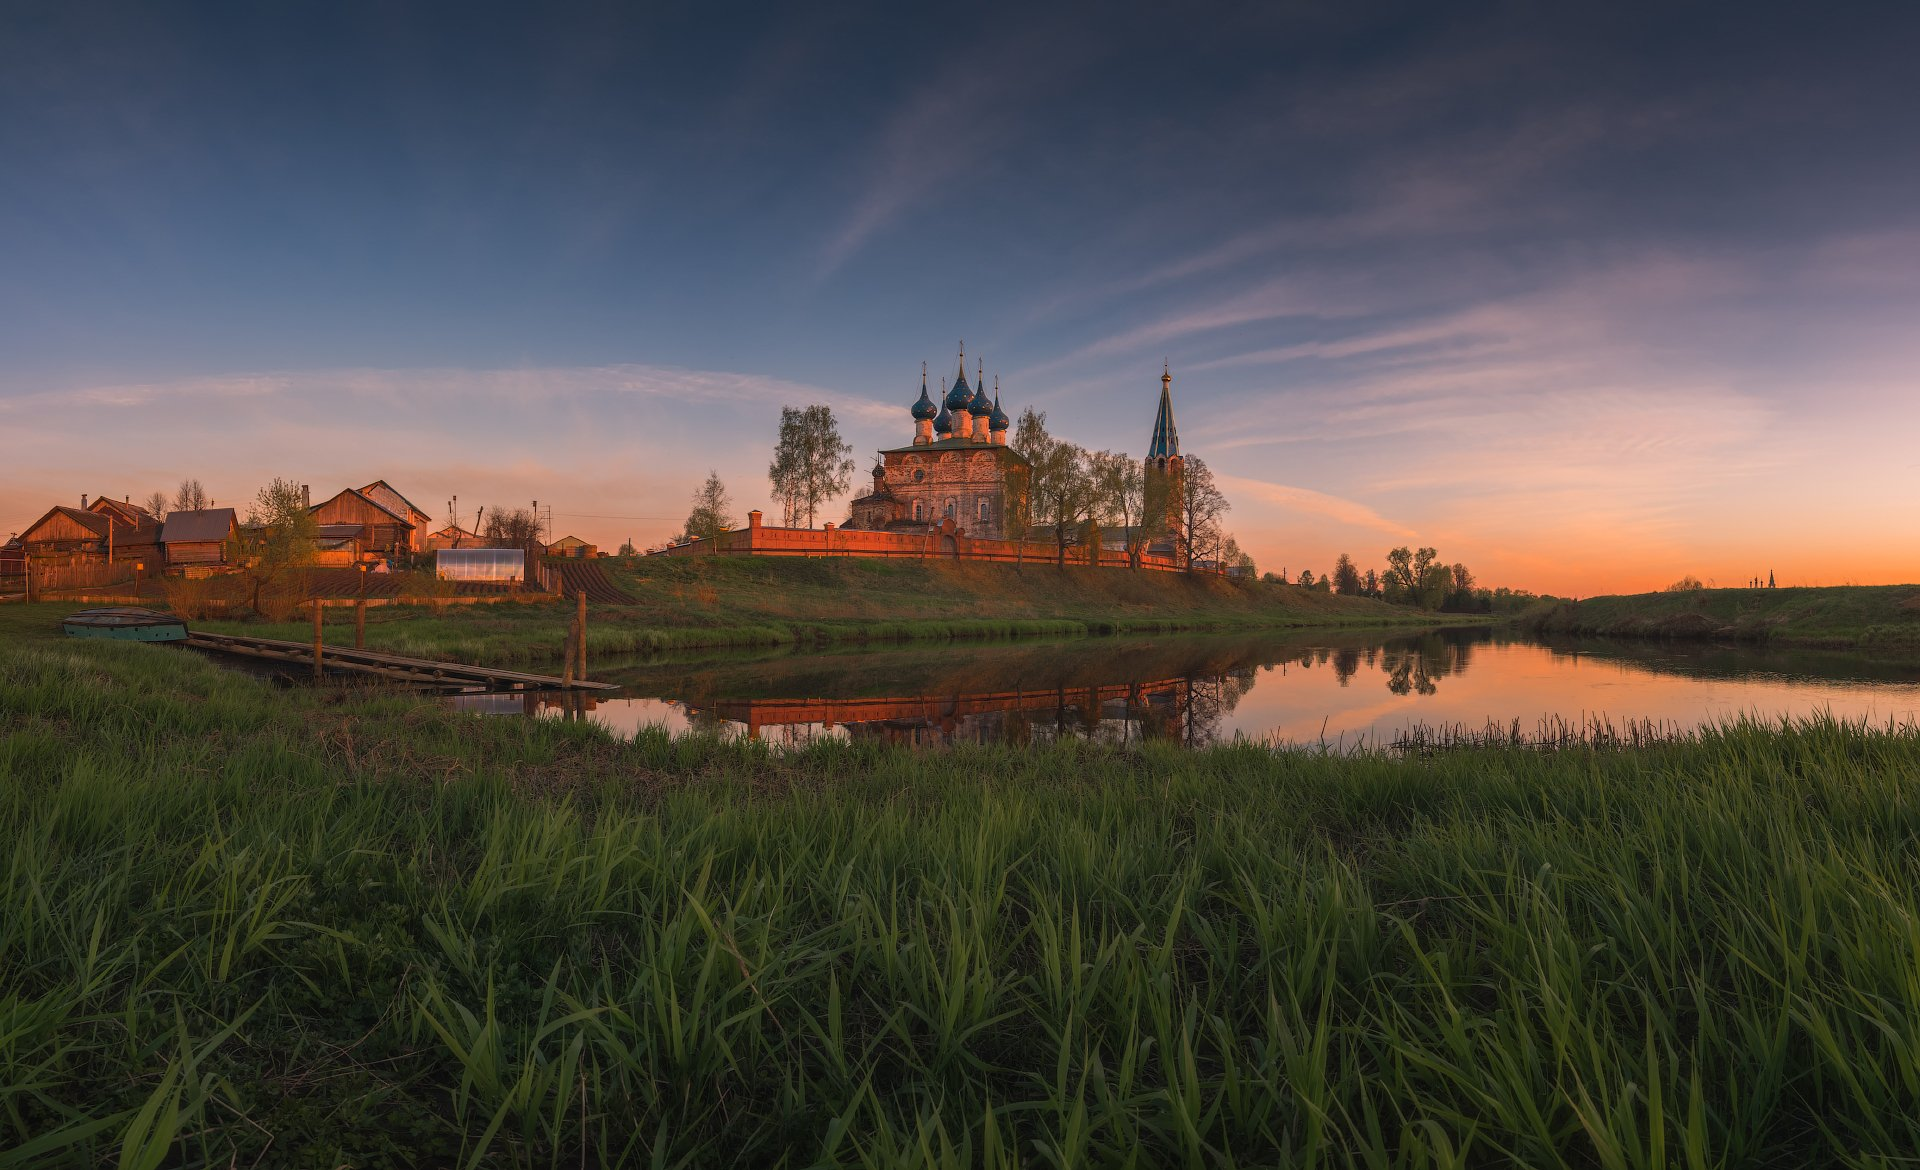 закат, вечер, река, пейзаж, дунилово, весна, Виталий Левыкин